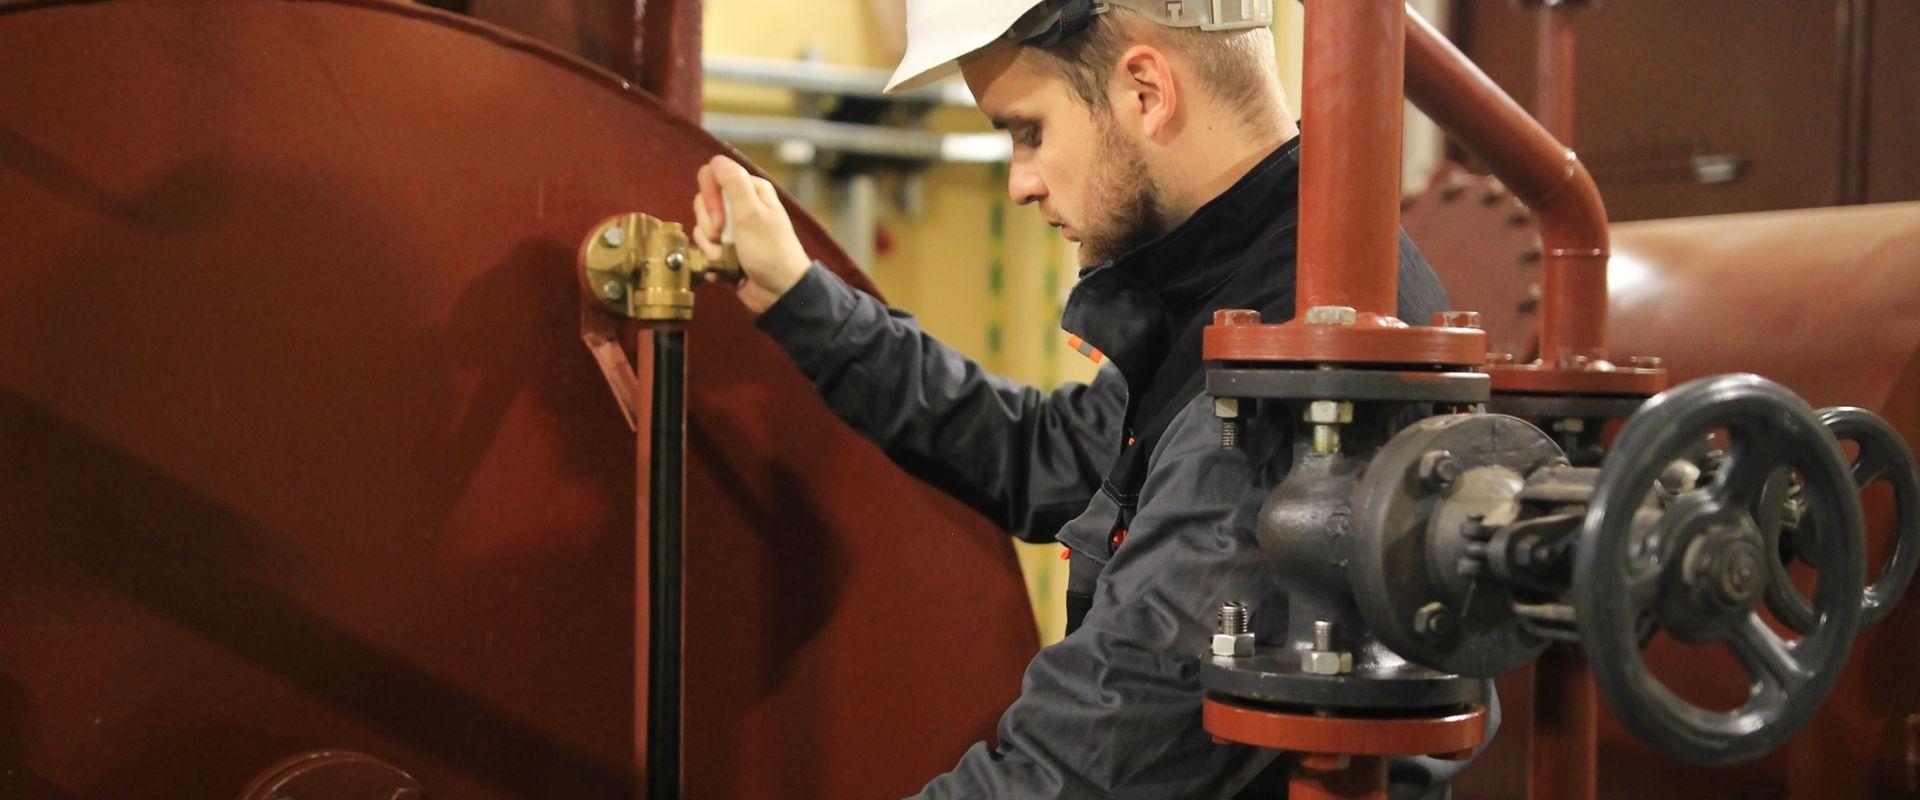 boiler mechanical services